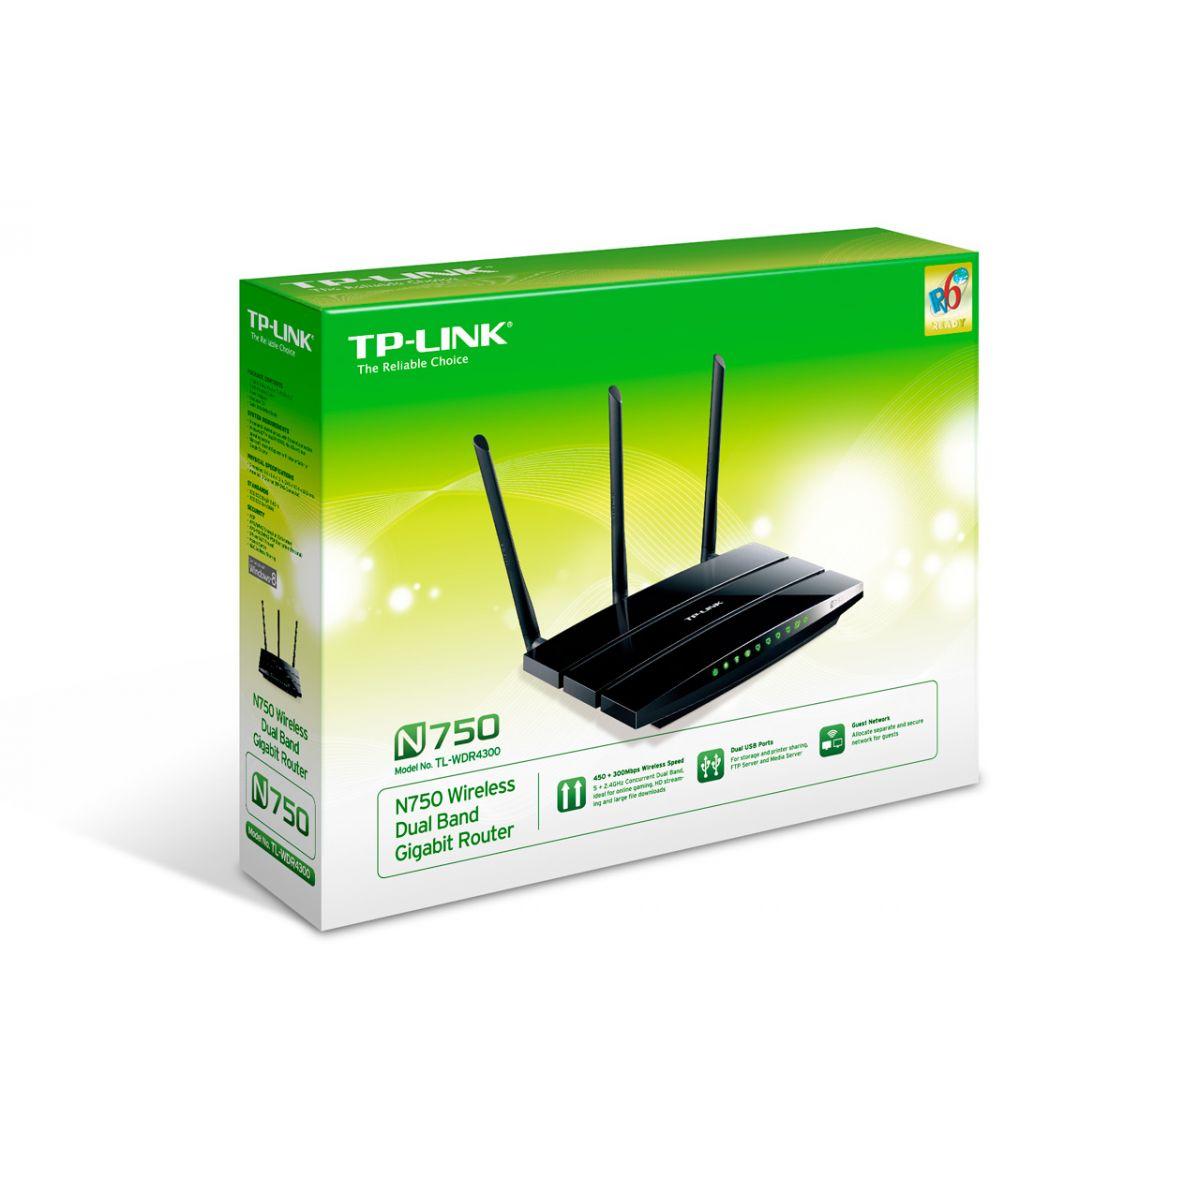 Roteador Gigabit Wireless De Banda Dupla N750 Tl-wdr4300